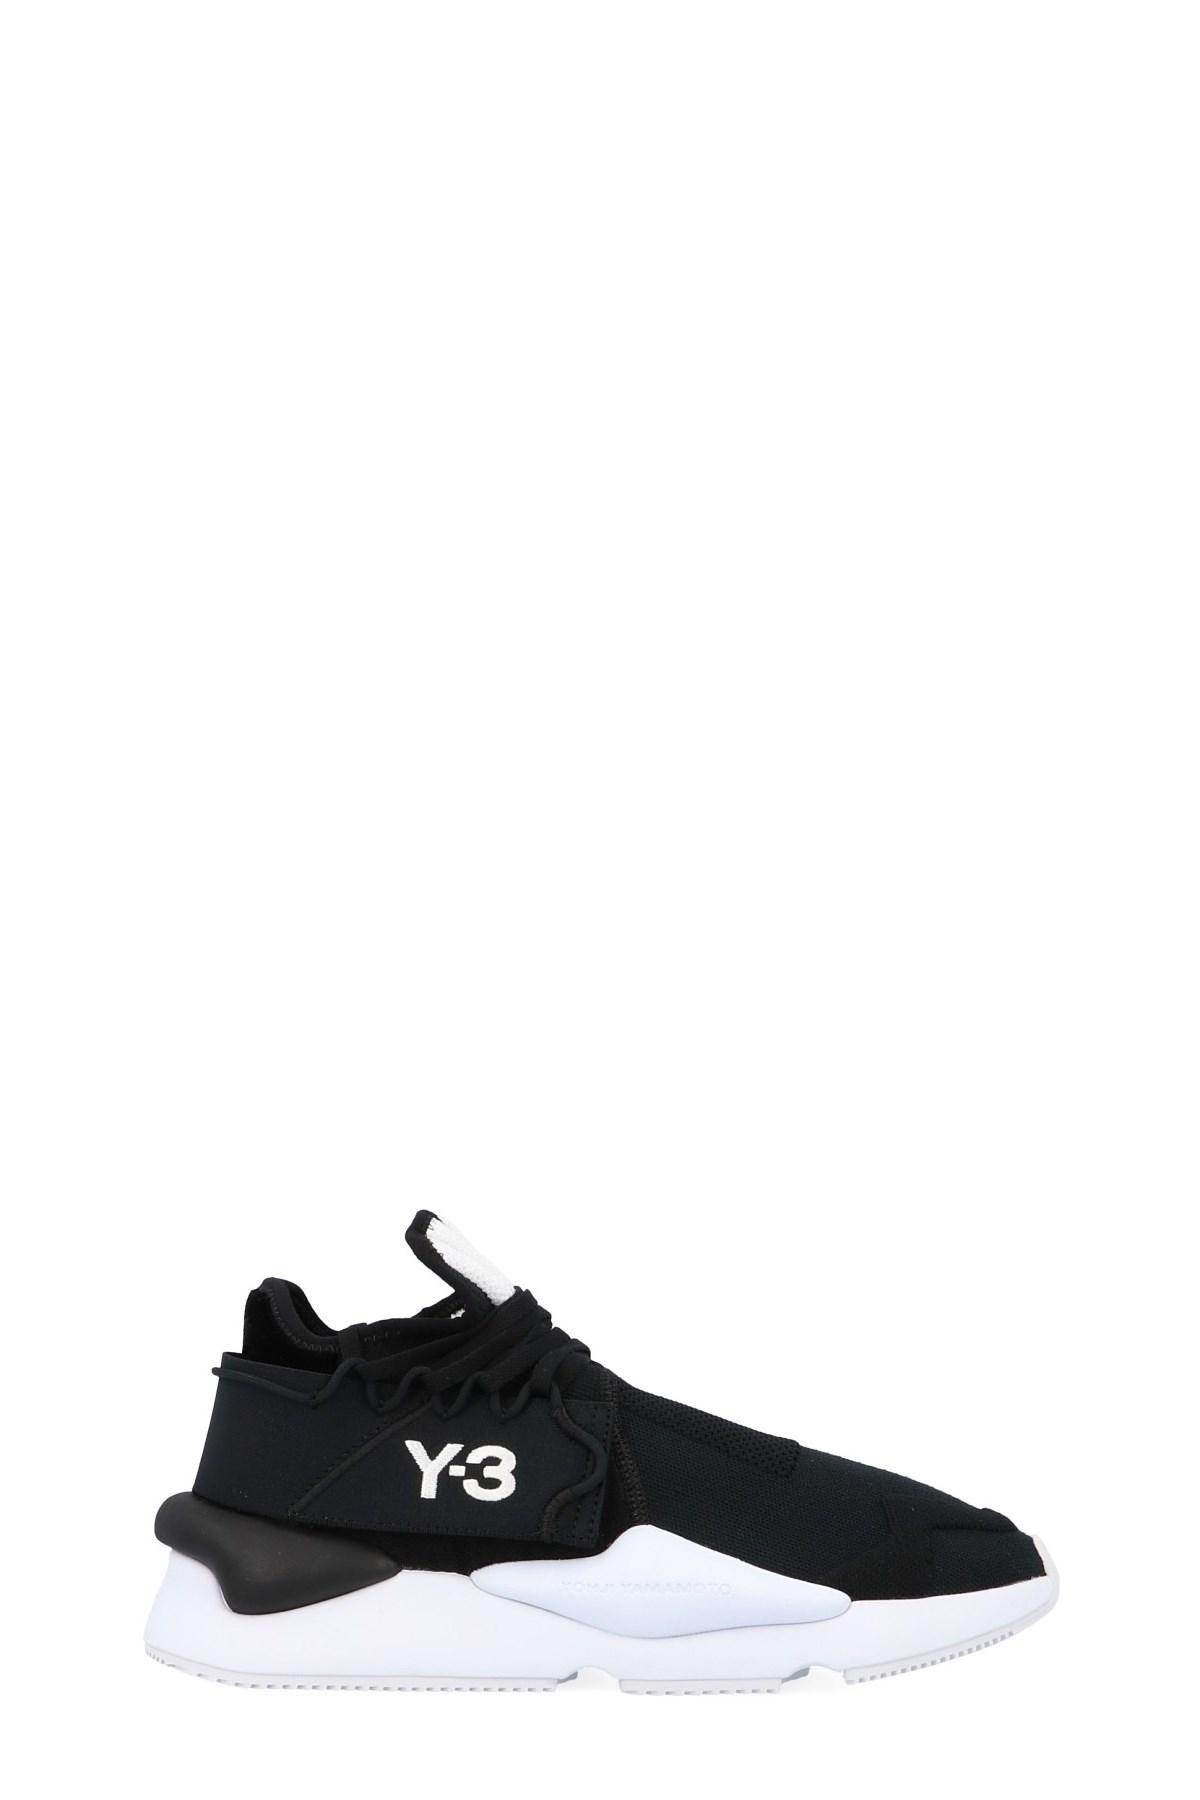 337e38d3c y-3  Kaiwa kint  sneakers available on julian-fashion.com - 67084